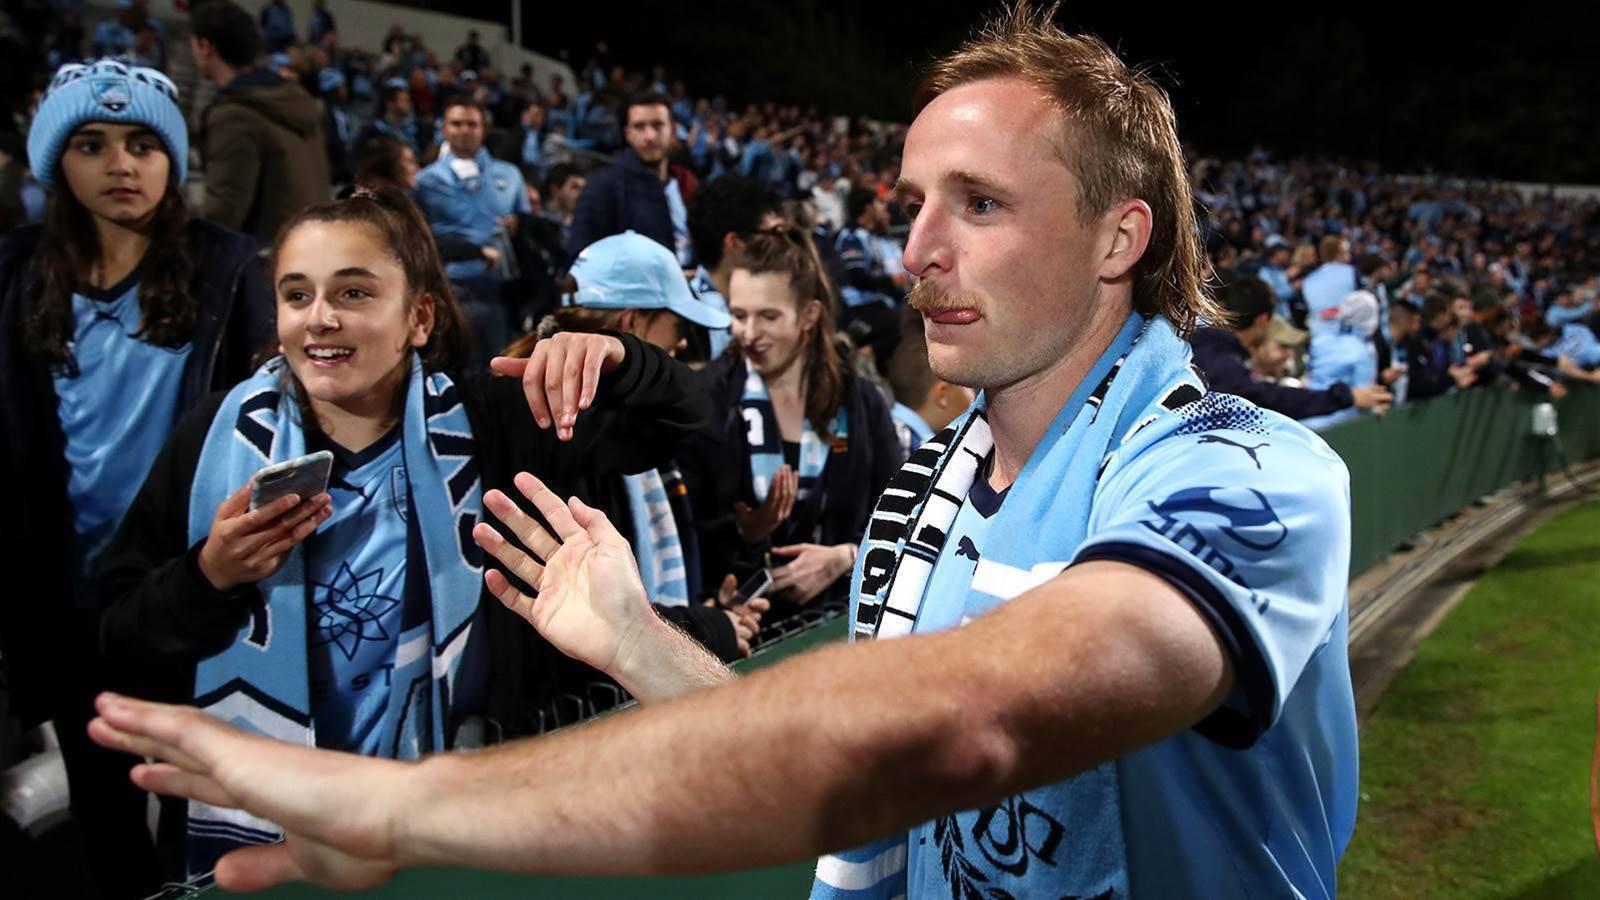 Sydney aim for rare interstate GF win